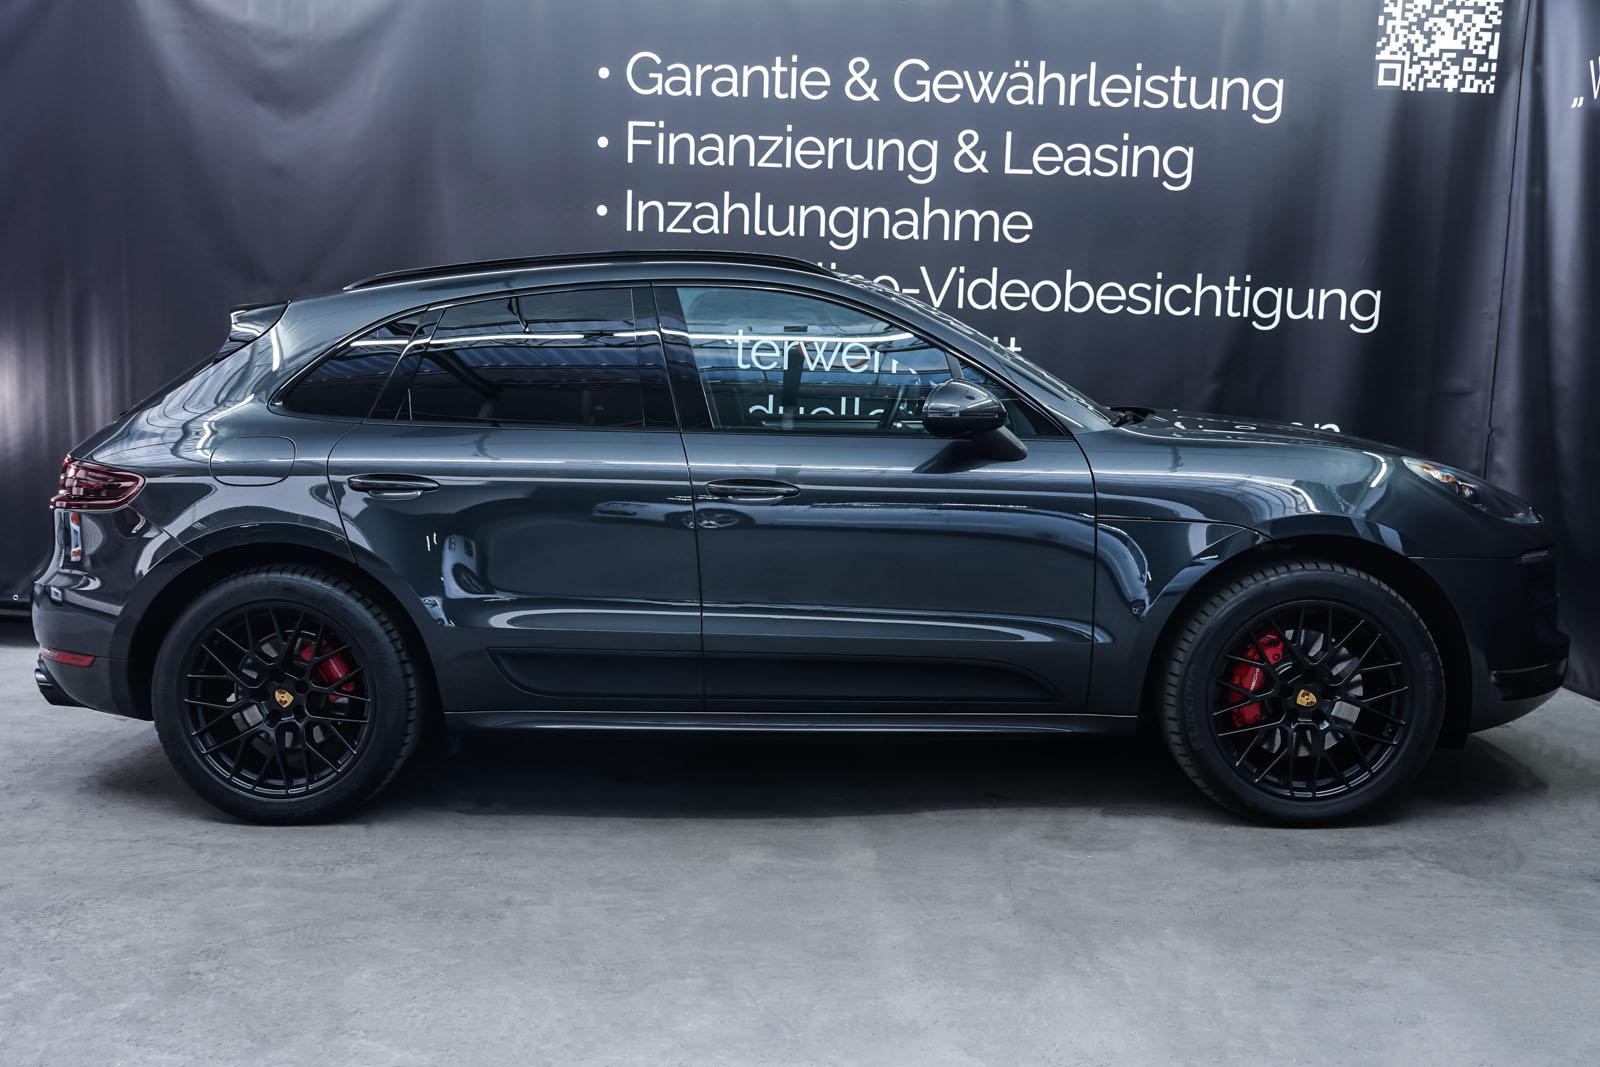 Porsche_Macan_GTS_Dunkelgrau_Schwarz_POR-8174_15_w